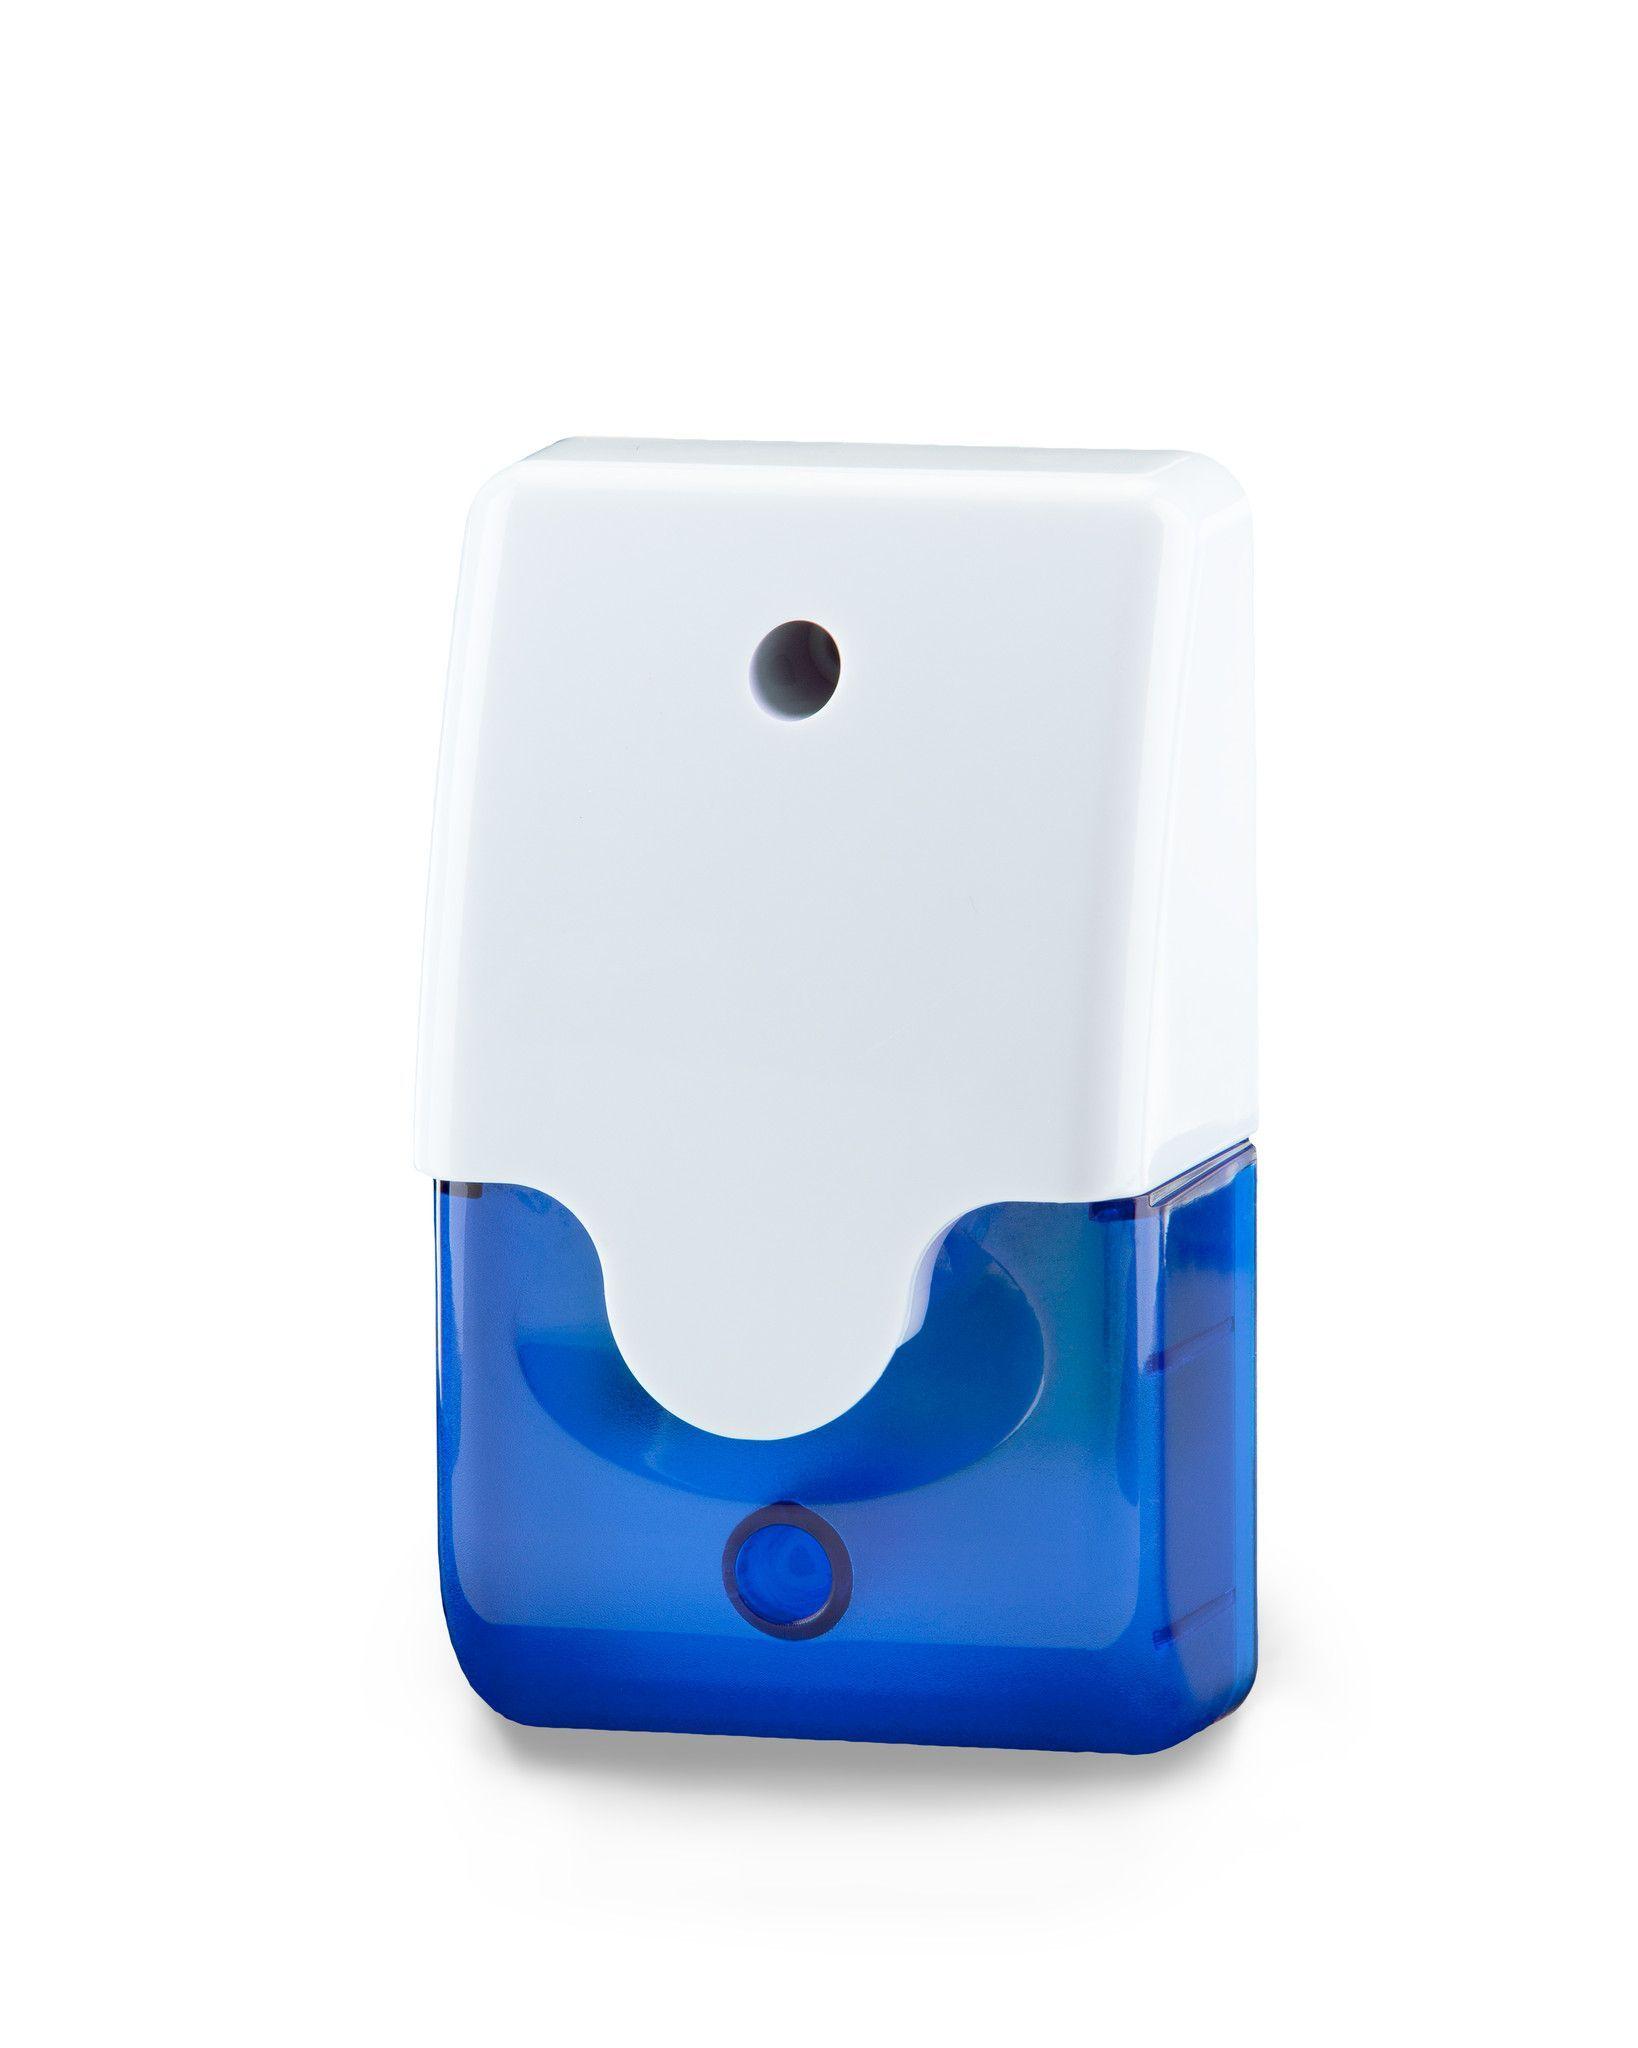 Telguard Gdc1 Universal Z Wave Garage Door Control Switch With Images Garage Door Controller Sectional Garage Doors Home Automation System